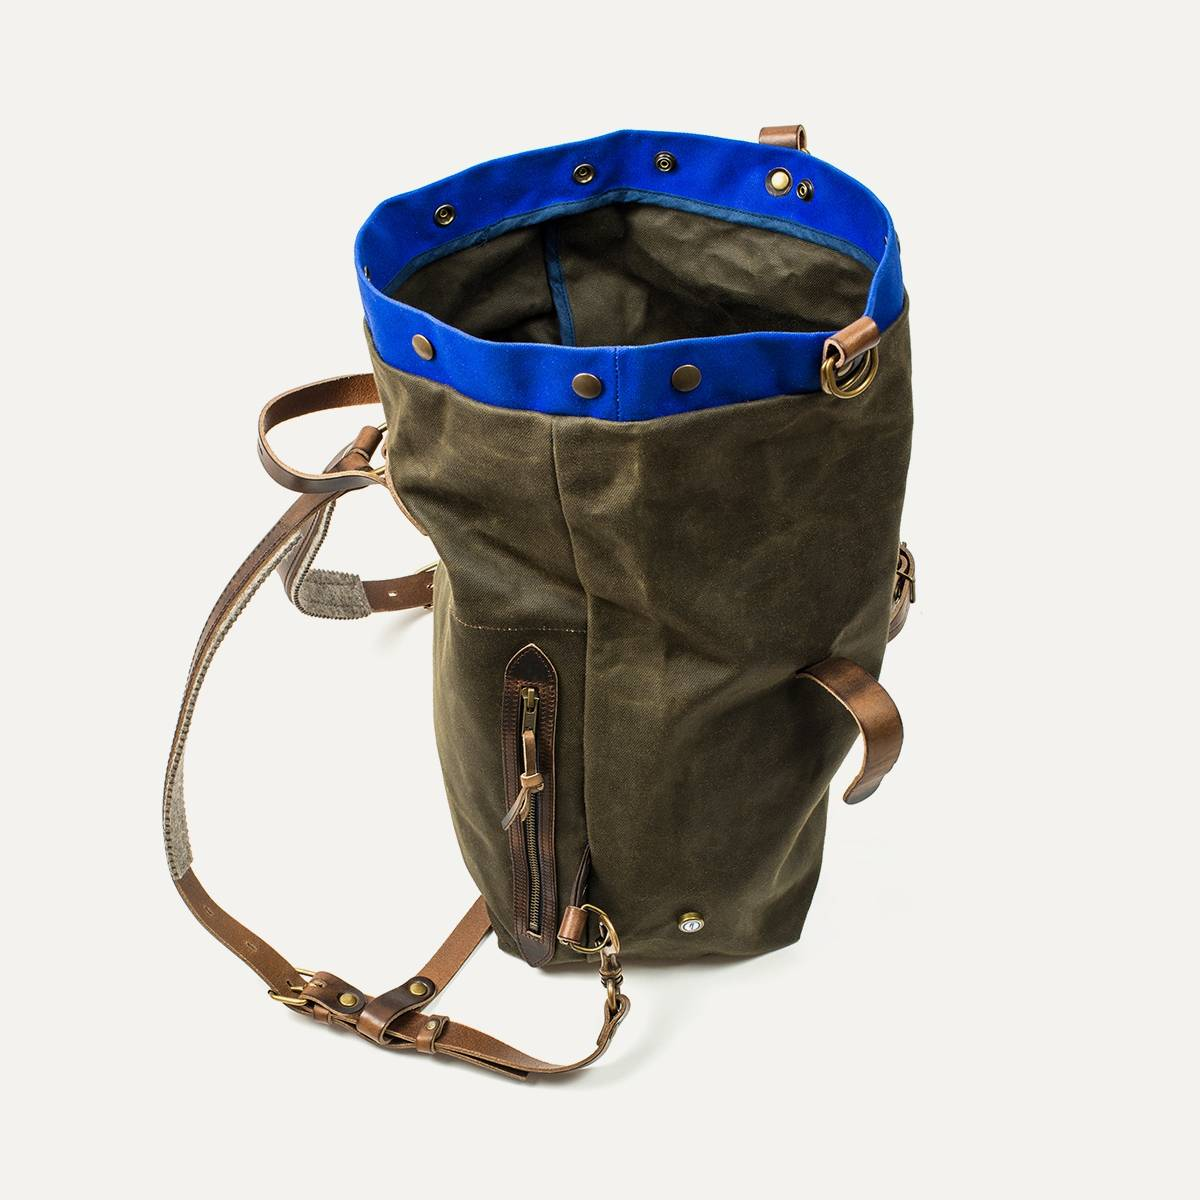 sac dos scout accessoire moto custom bleu de chauffe. Black Bedroom Furniture Sets. Home Design Ideas